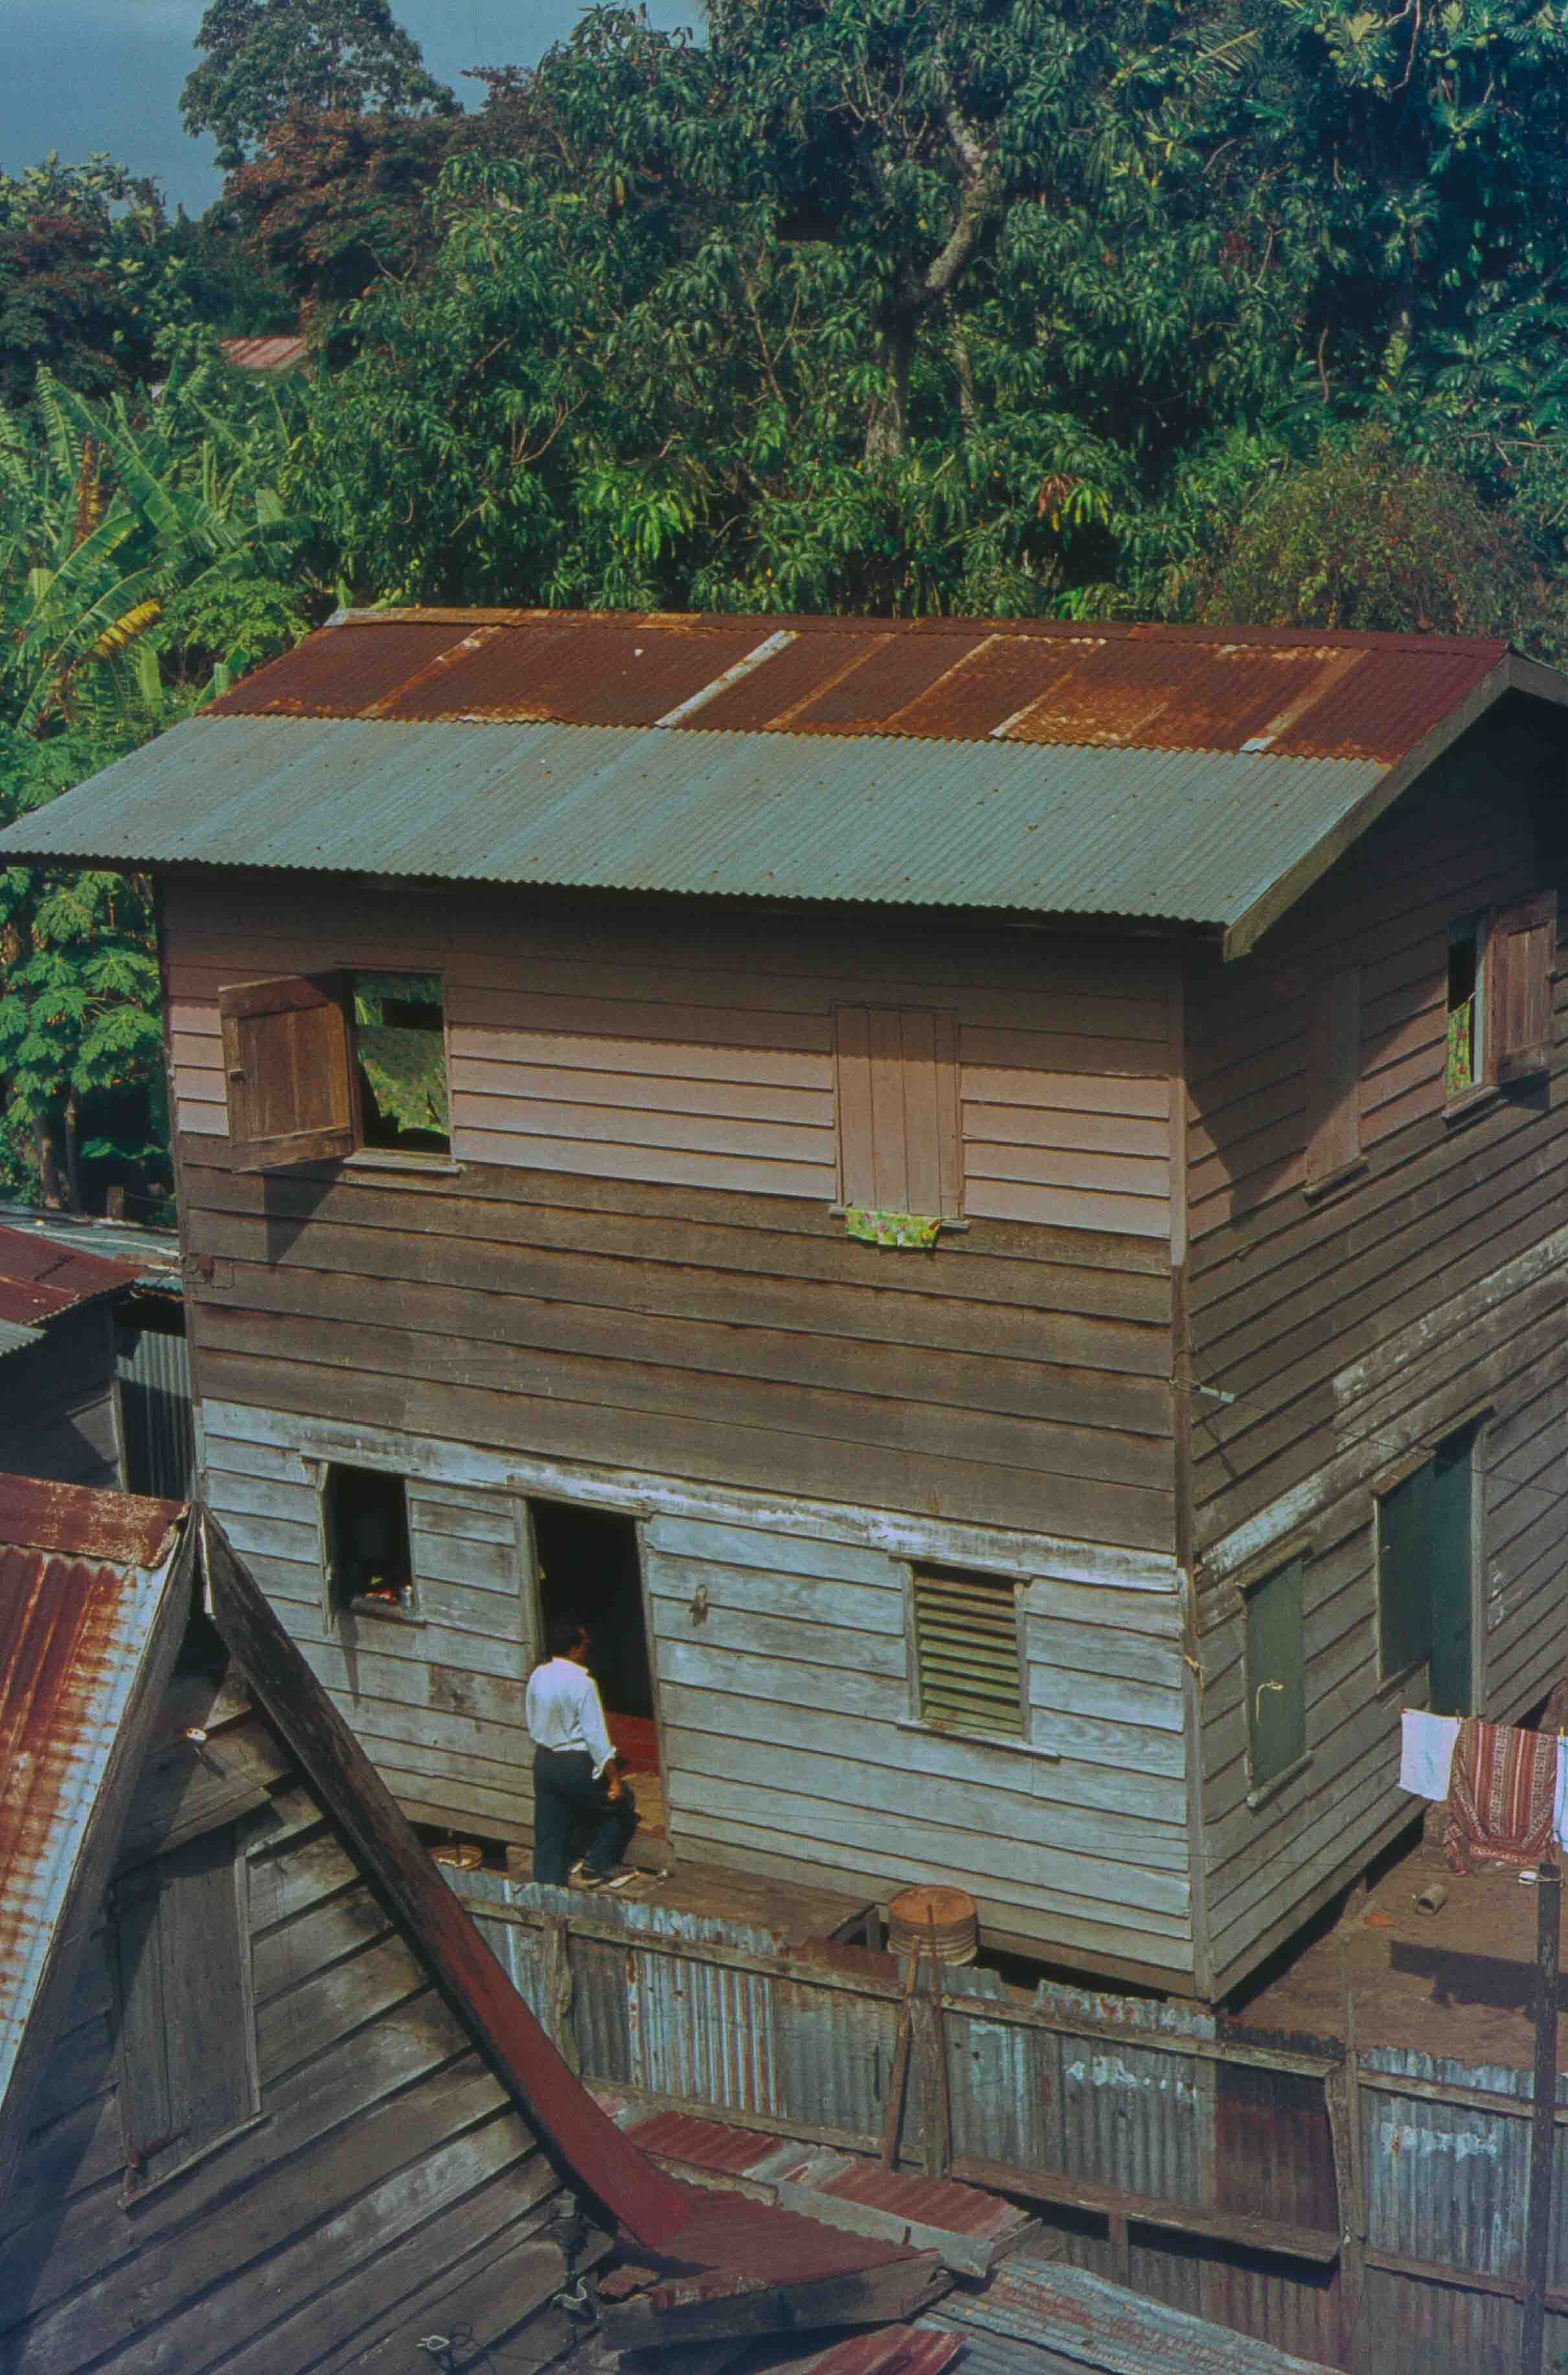 202. Suriname